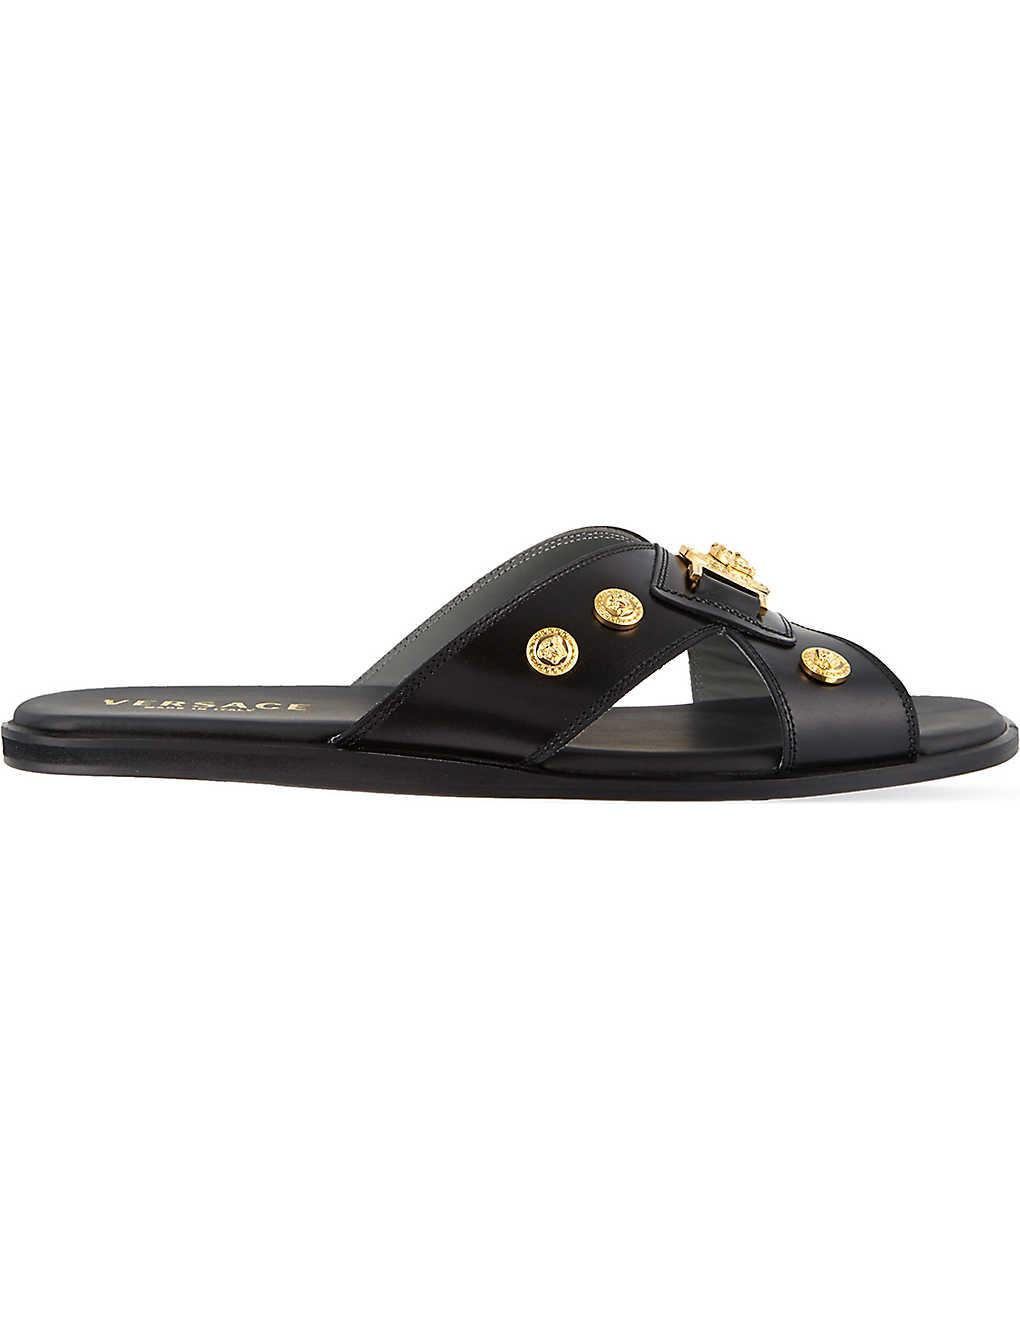 5403ba71b7 VERSACE - Multi medusa sandals | Selfridges.com